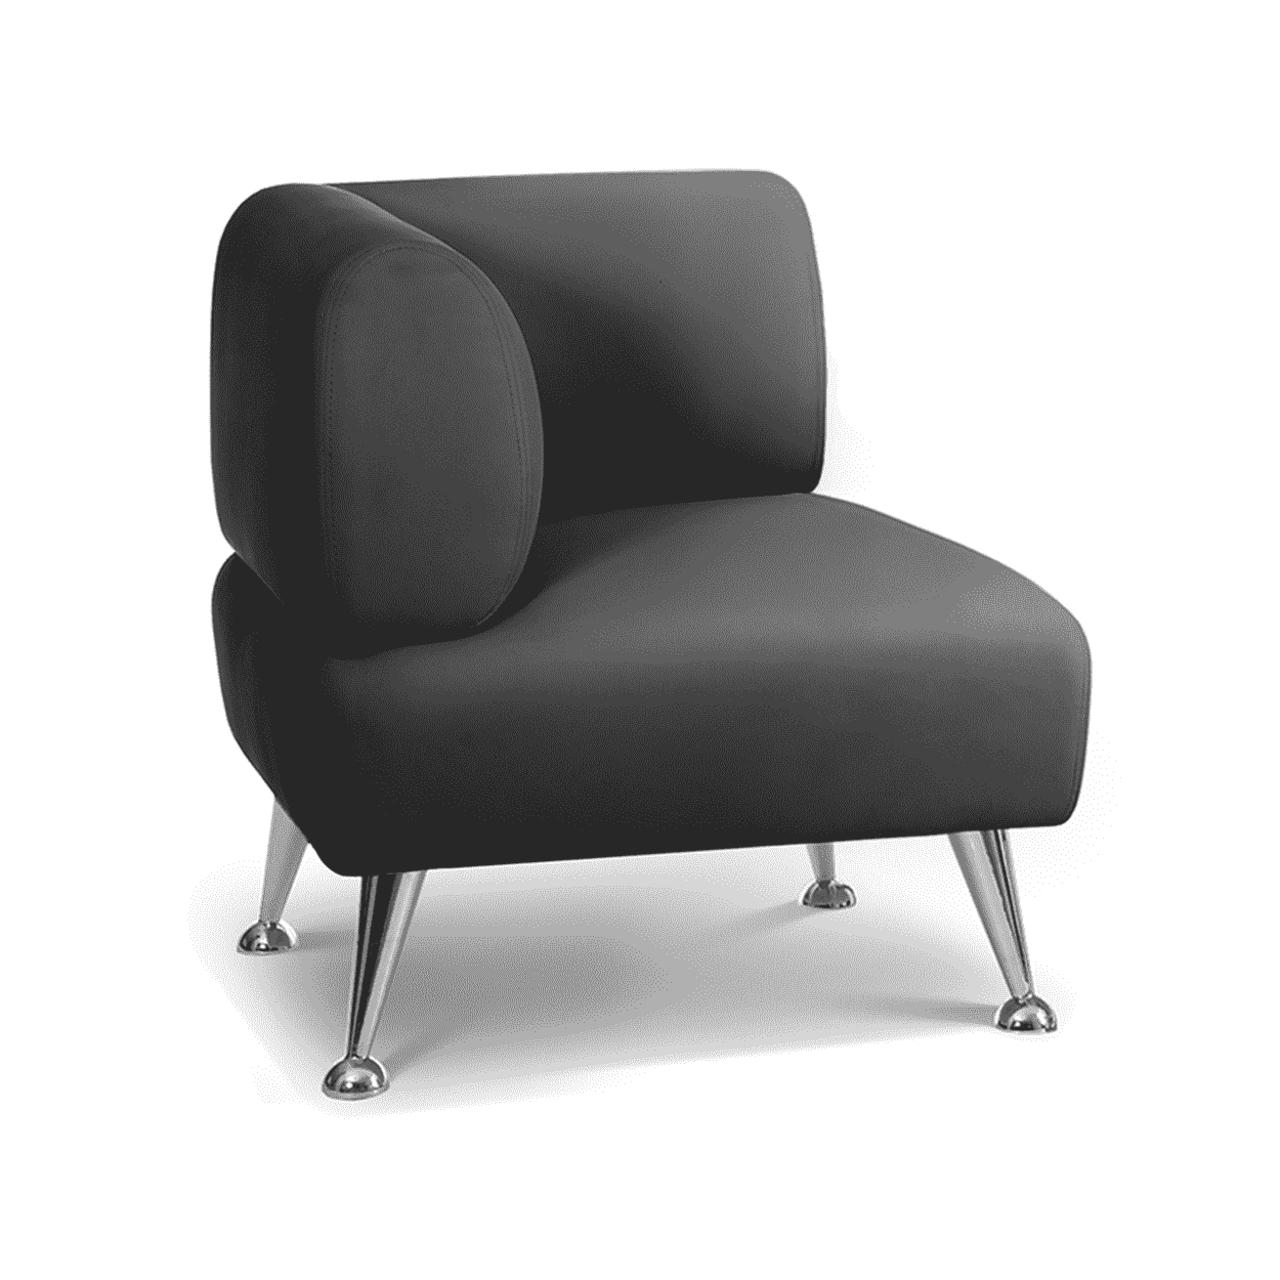 Кресло левое  Калипсо 84x71x77 - фото 1